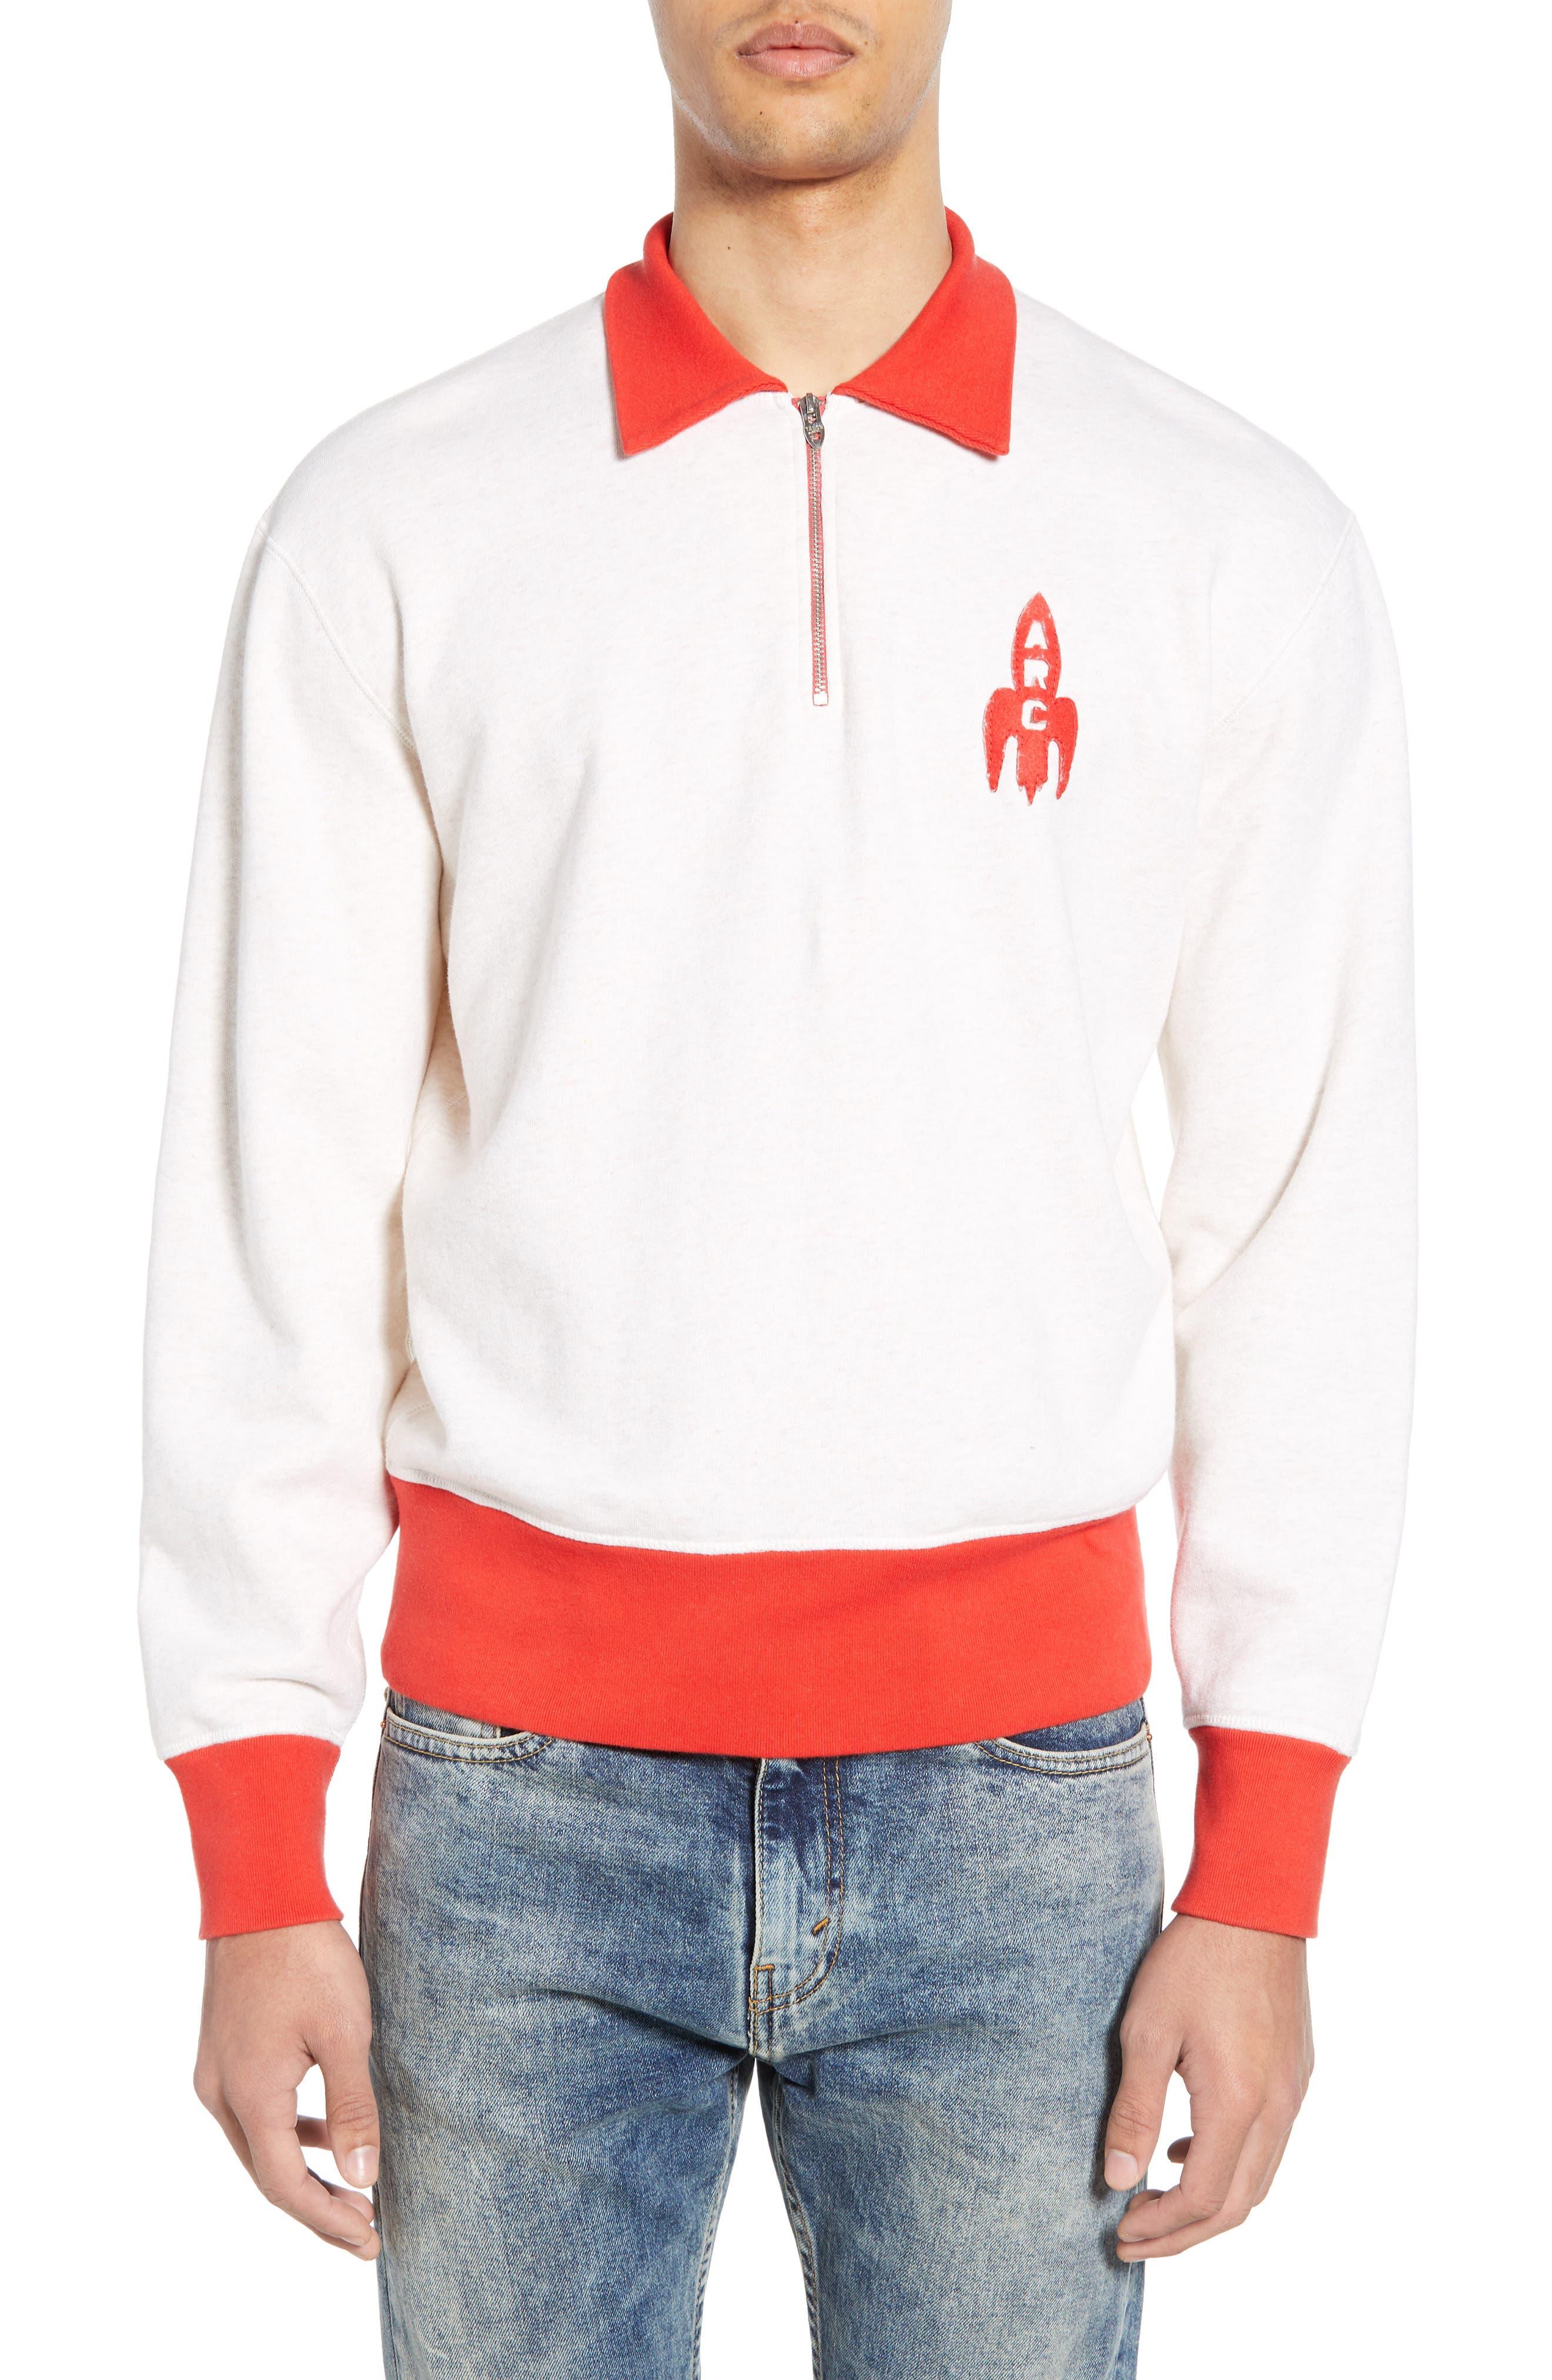 72c35090 Men's Levi's® Vintage Clothing Hoodies & Sweatshirts | Nordstrom